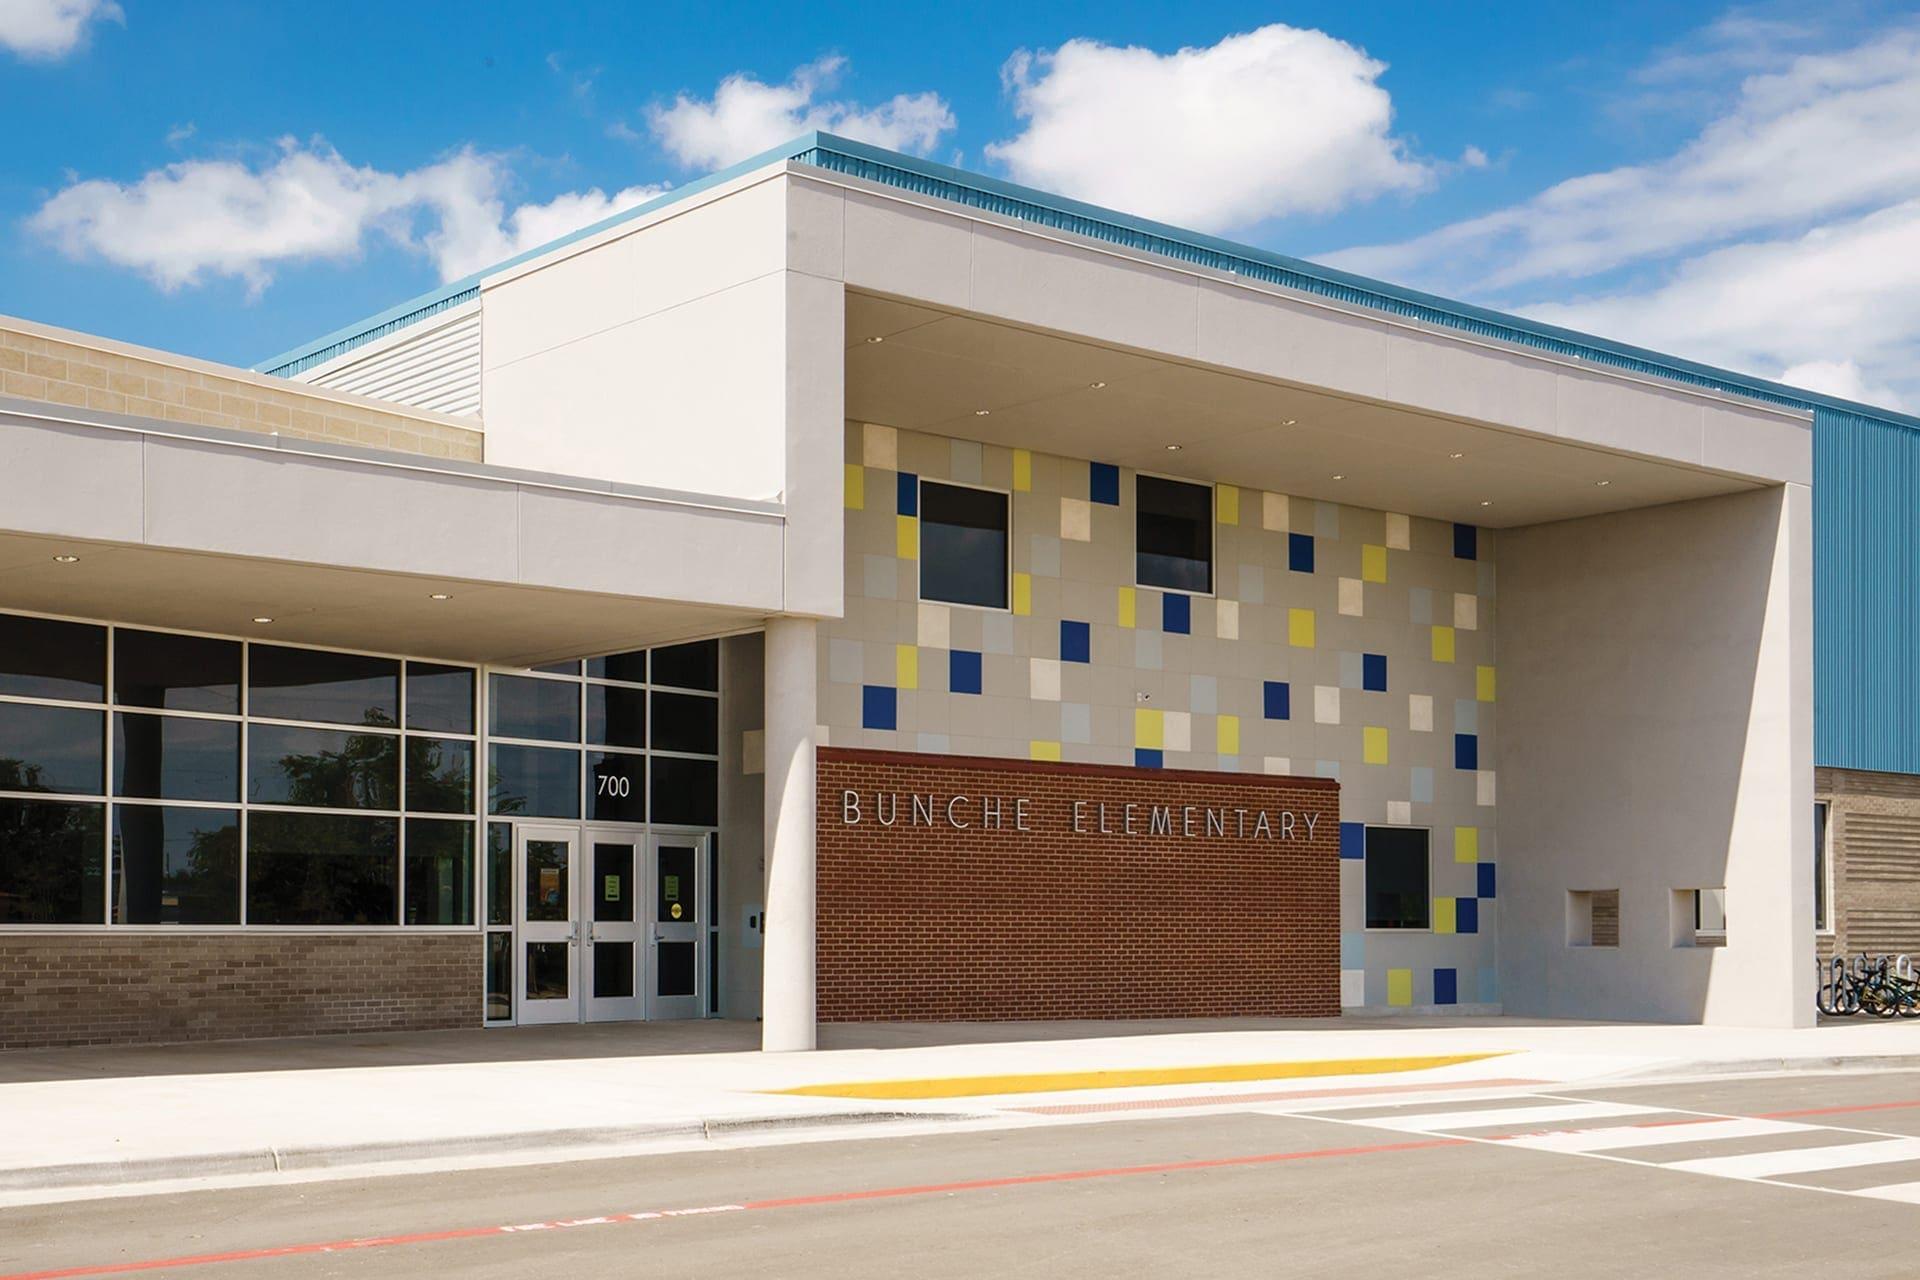 Ralph Bunche Elementary School Exterior Photo